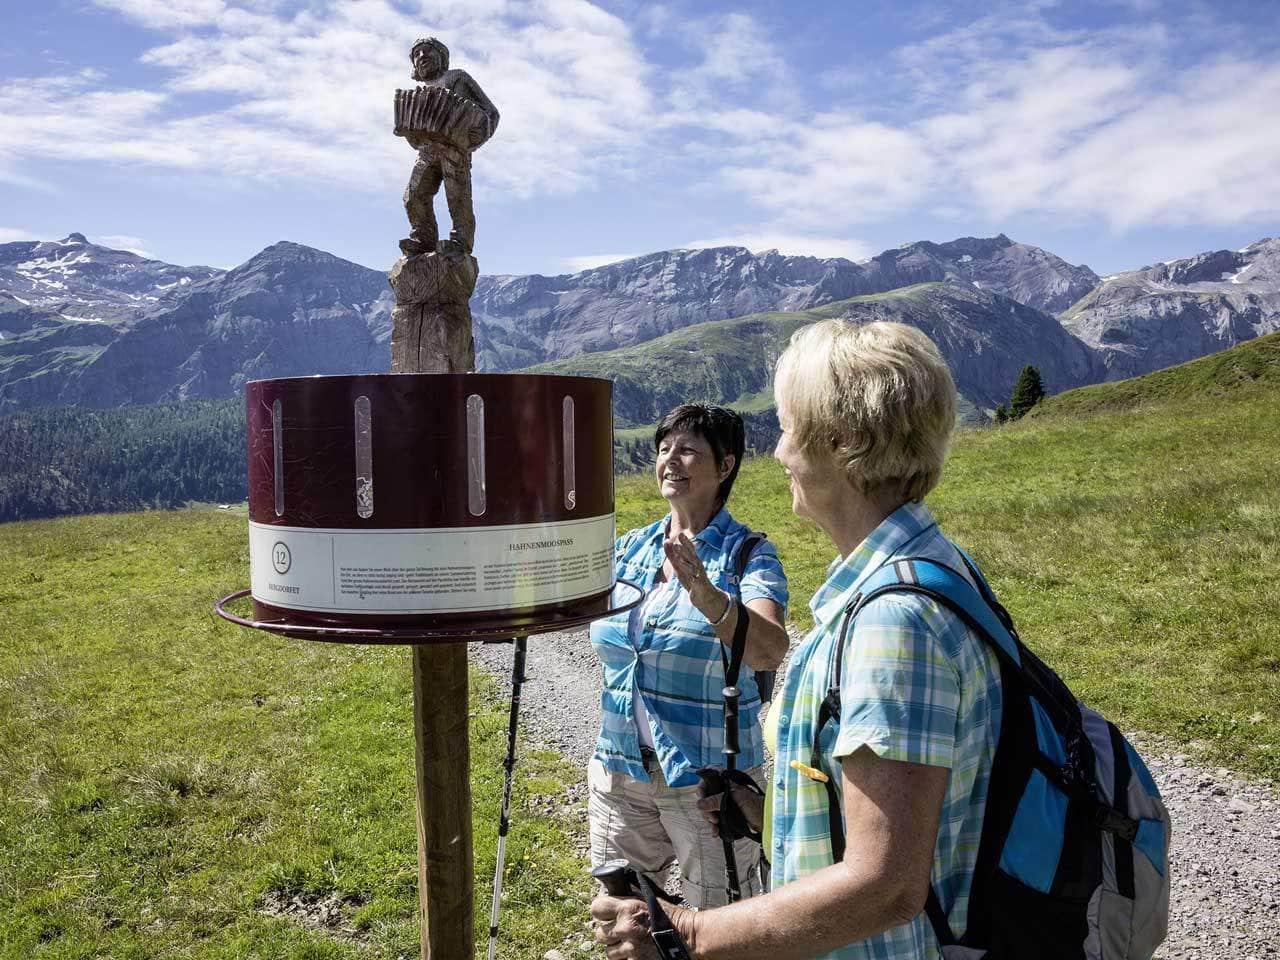 : Berner Oberland - AlpRundweg und Detektiv-Trail an der Lenk